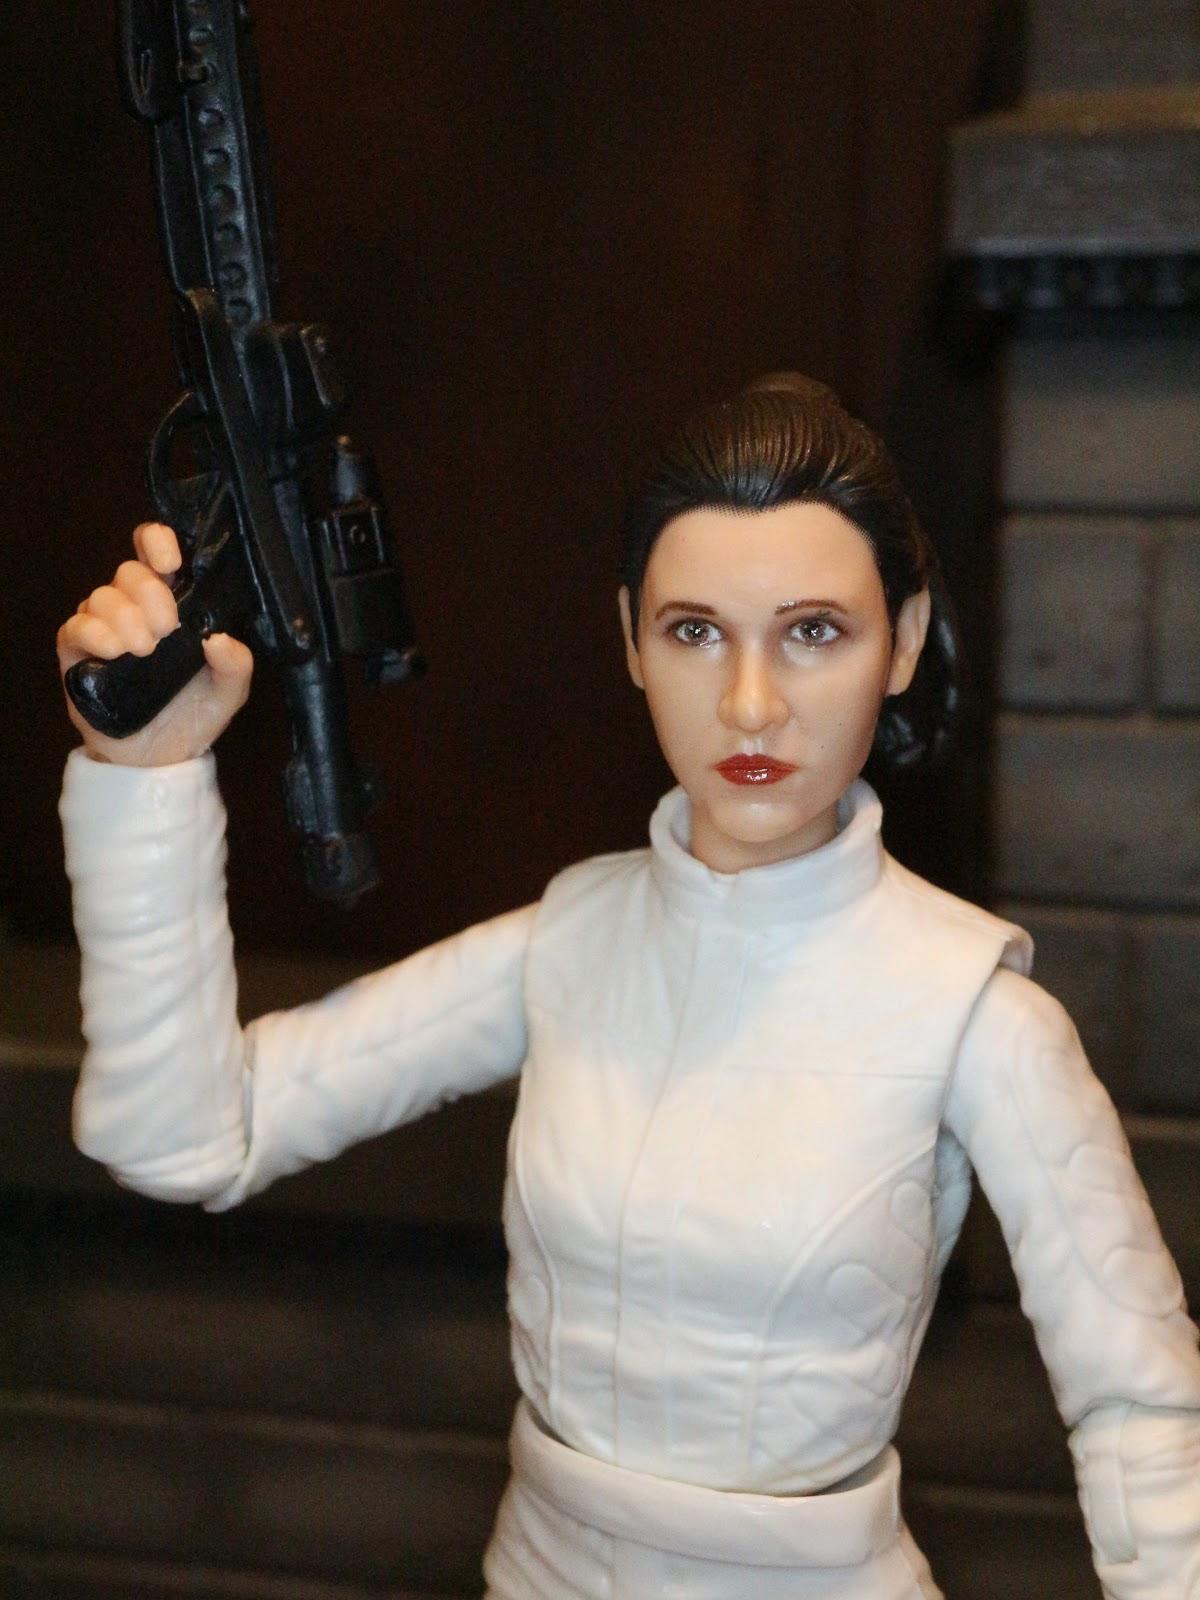 6-inch Figure Bespin Escape Star Wars Black Series princesse leia